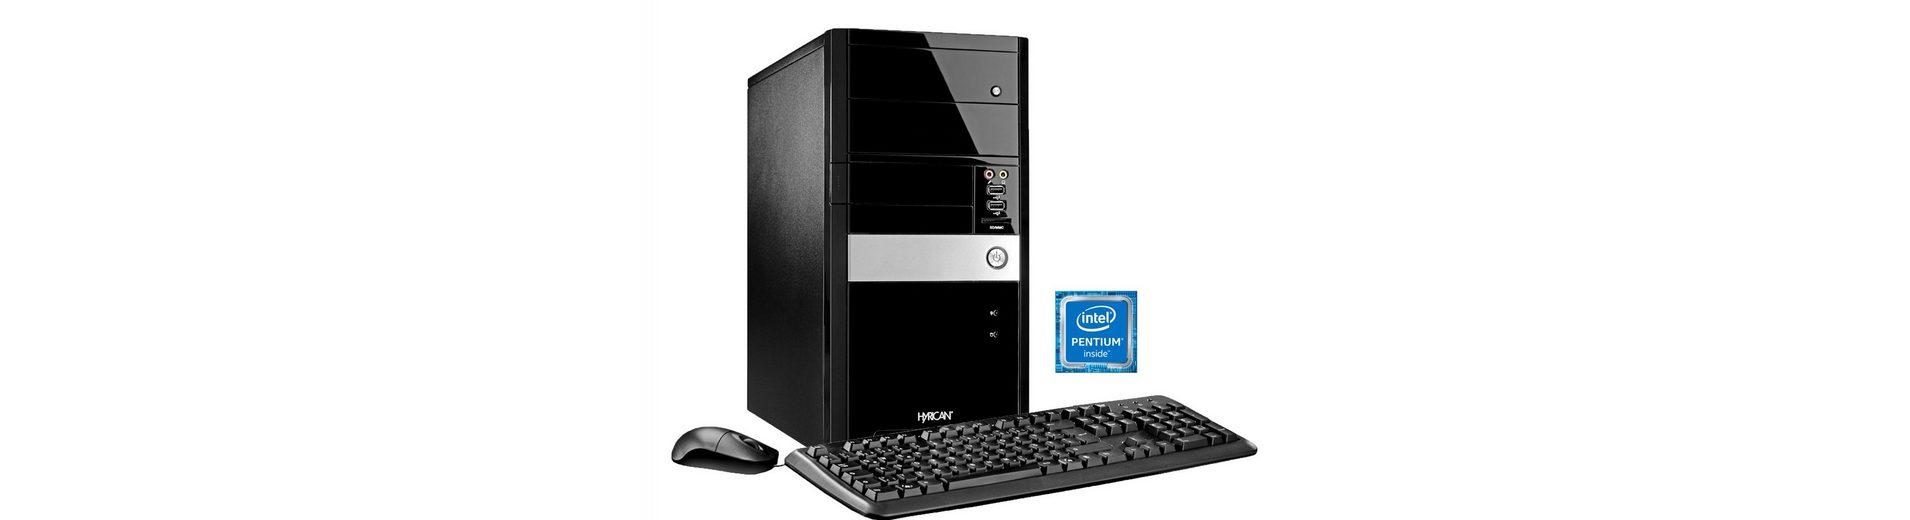 Hyrican PC Intel® Pentium® G4400, 16GB, 2TB, GT730 2GB, Windows 10 »Gigabyte Edition PC 5110«